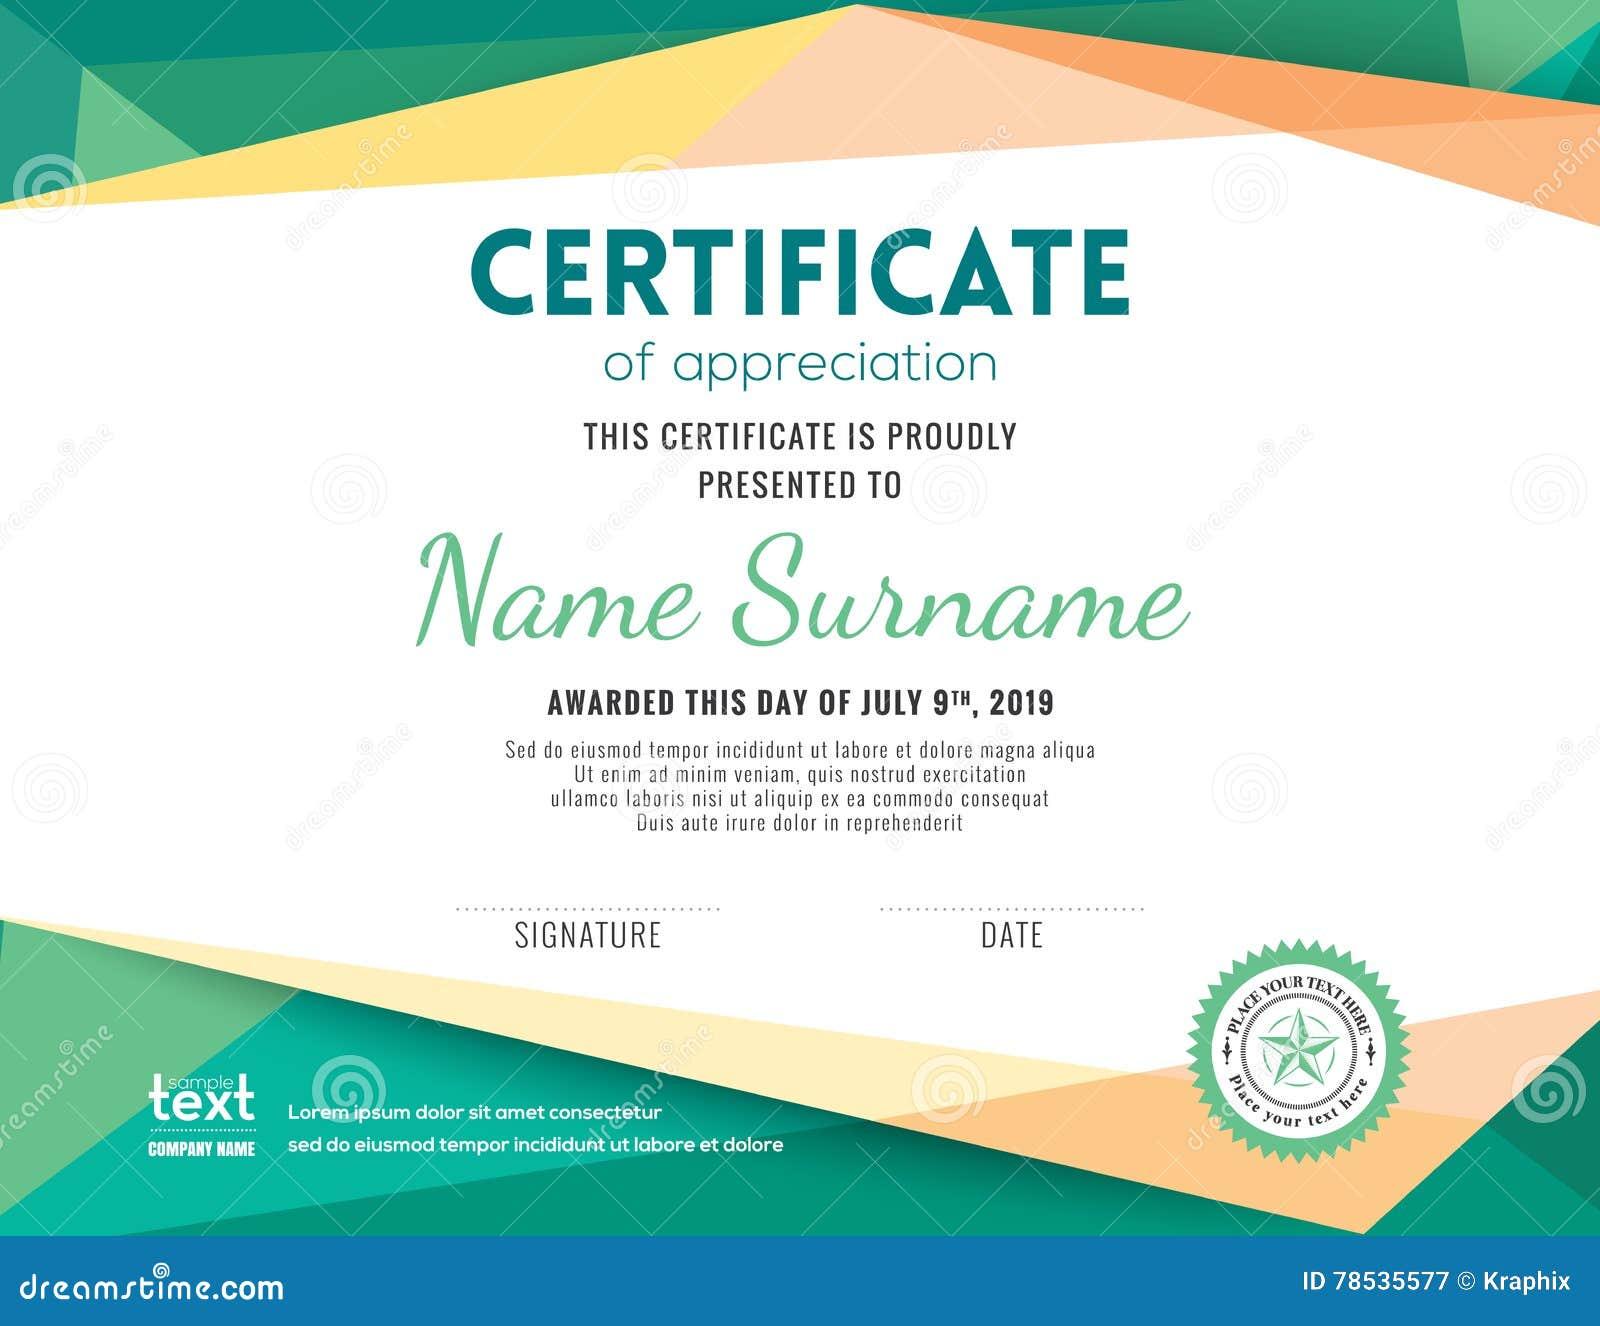 Design Certificate Template